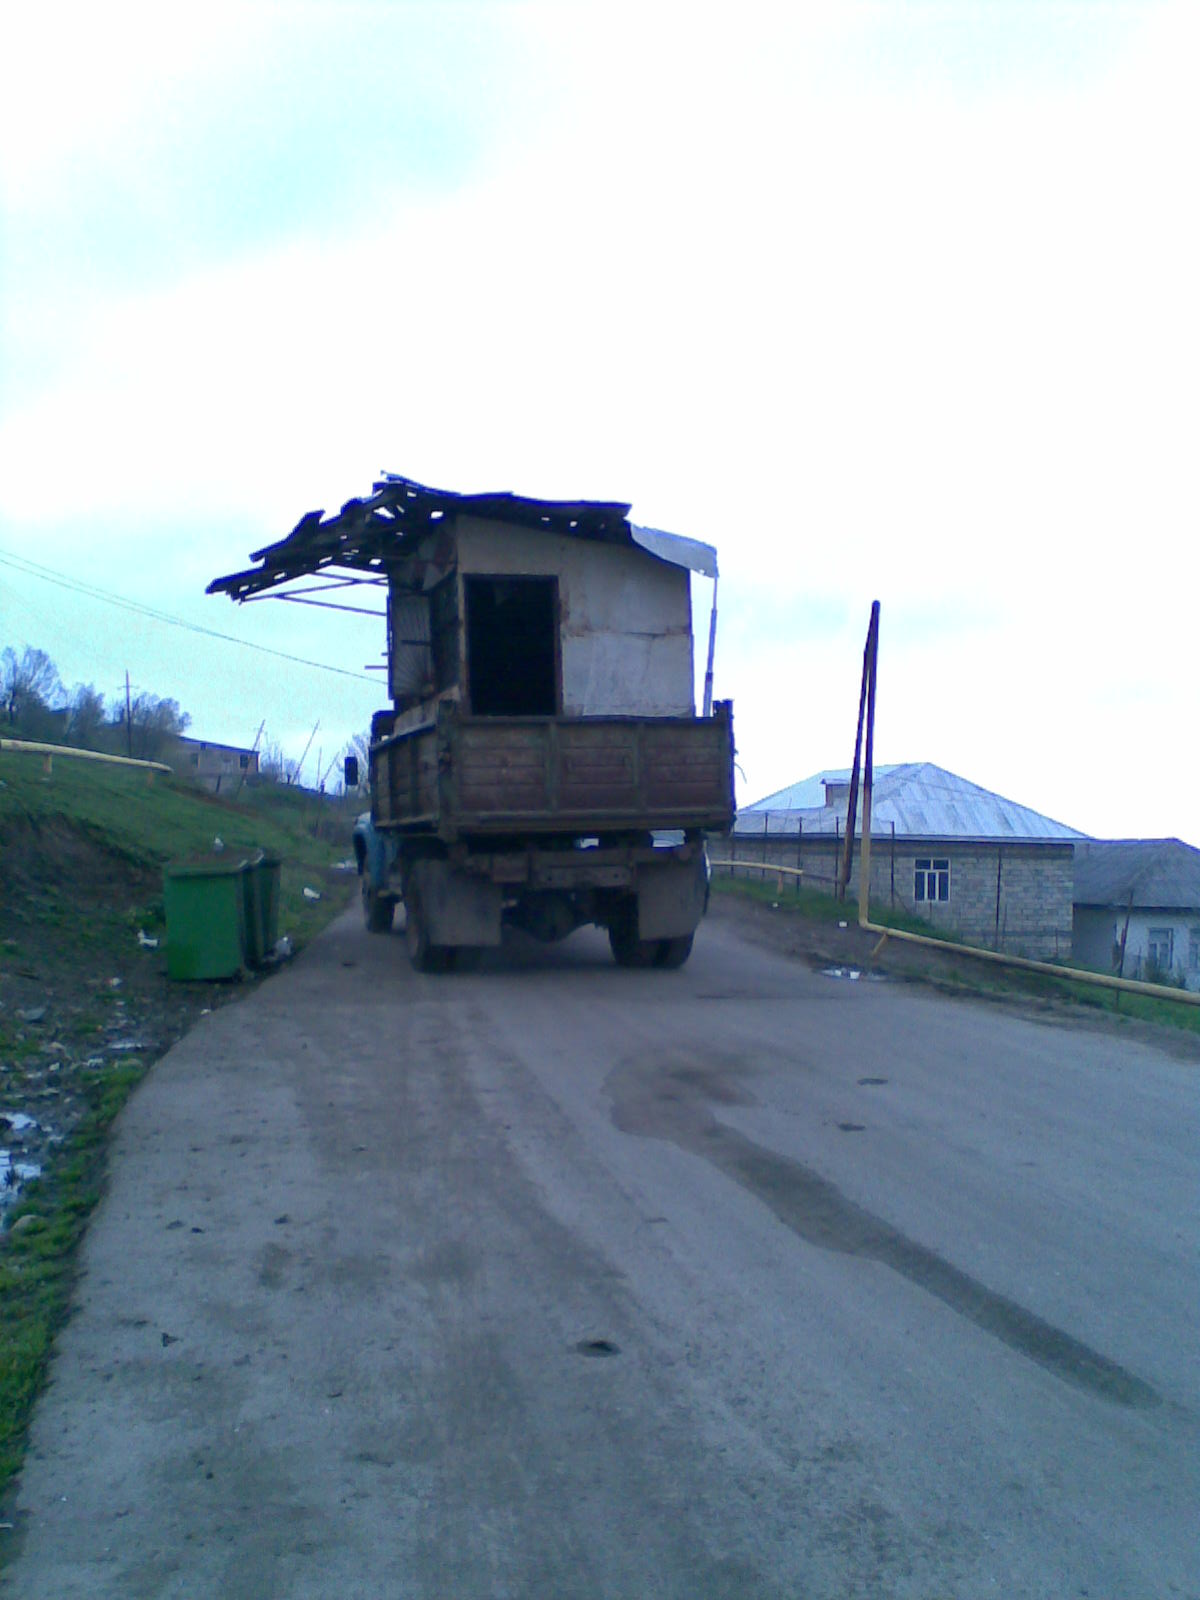 http://1.bp.blogspot.com/_RnMf4oCuhwY/S-UnuMkJbYI/AAAAAAAAAP8/qH8wTgwTXcI/s1600/The+traveling+shack.jpg